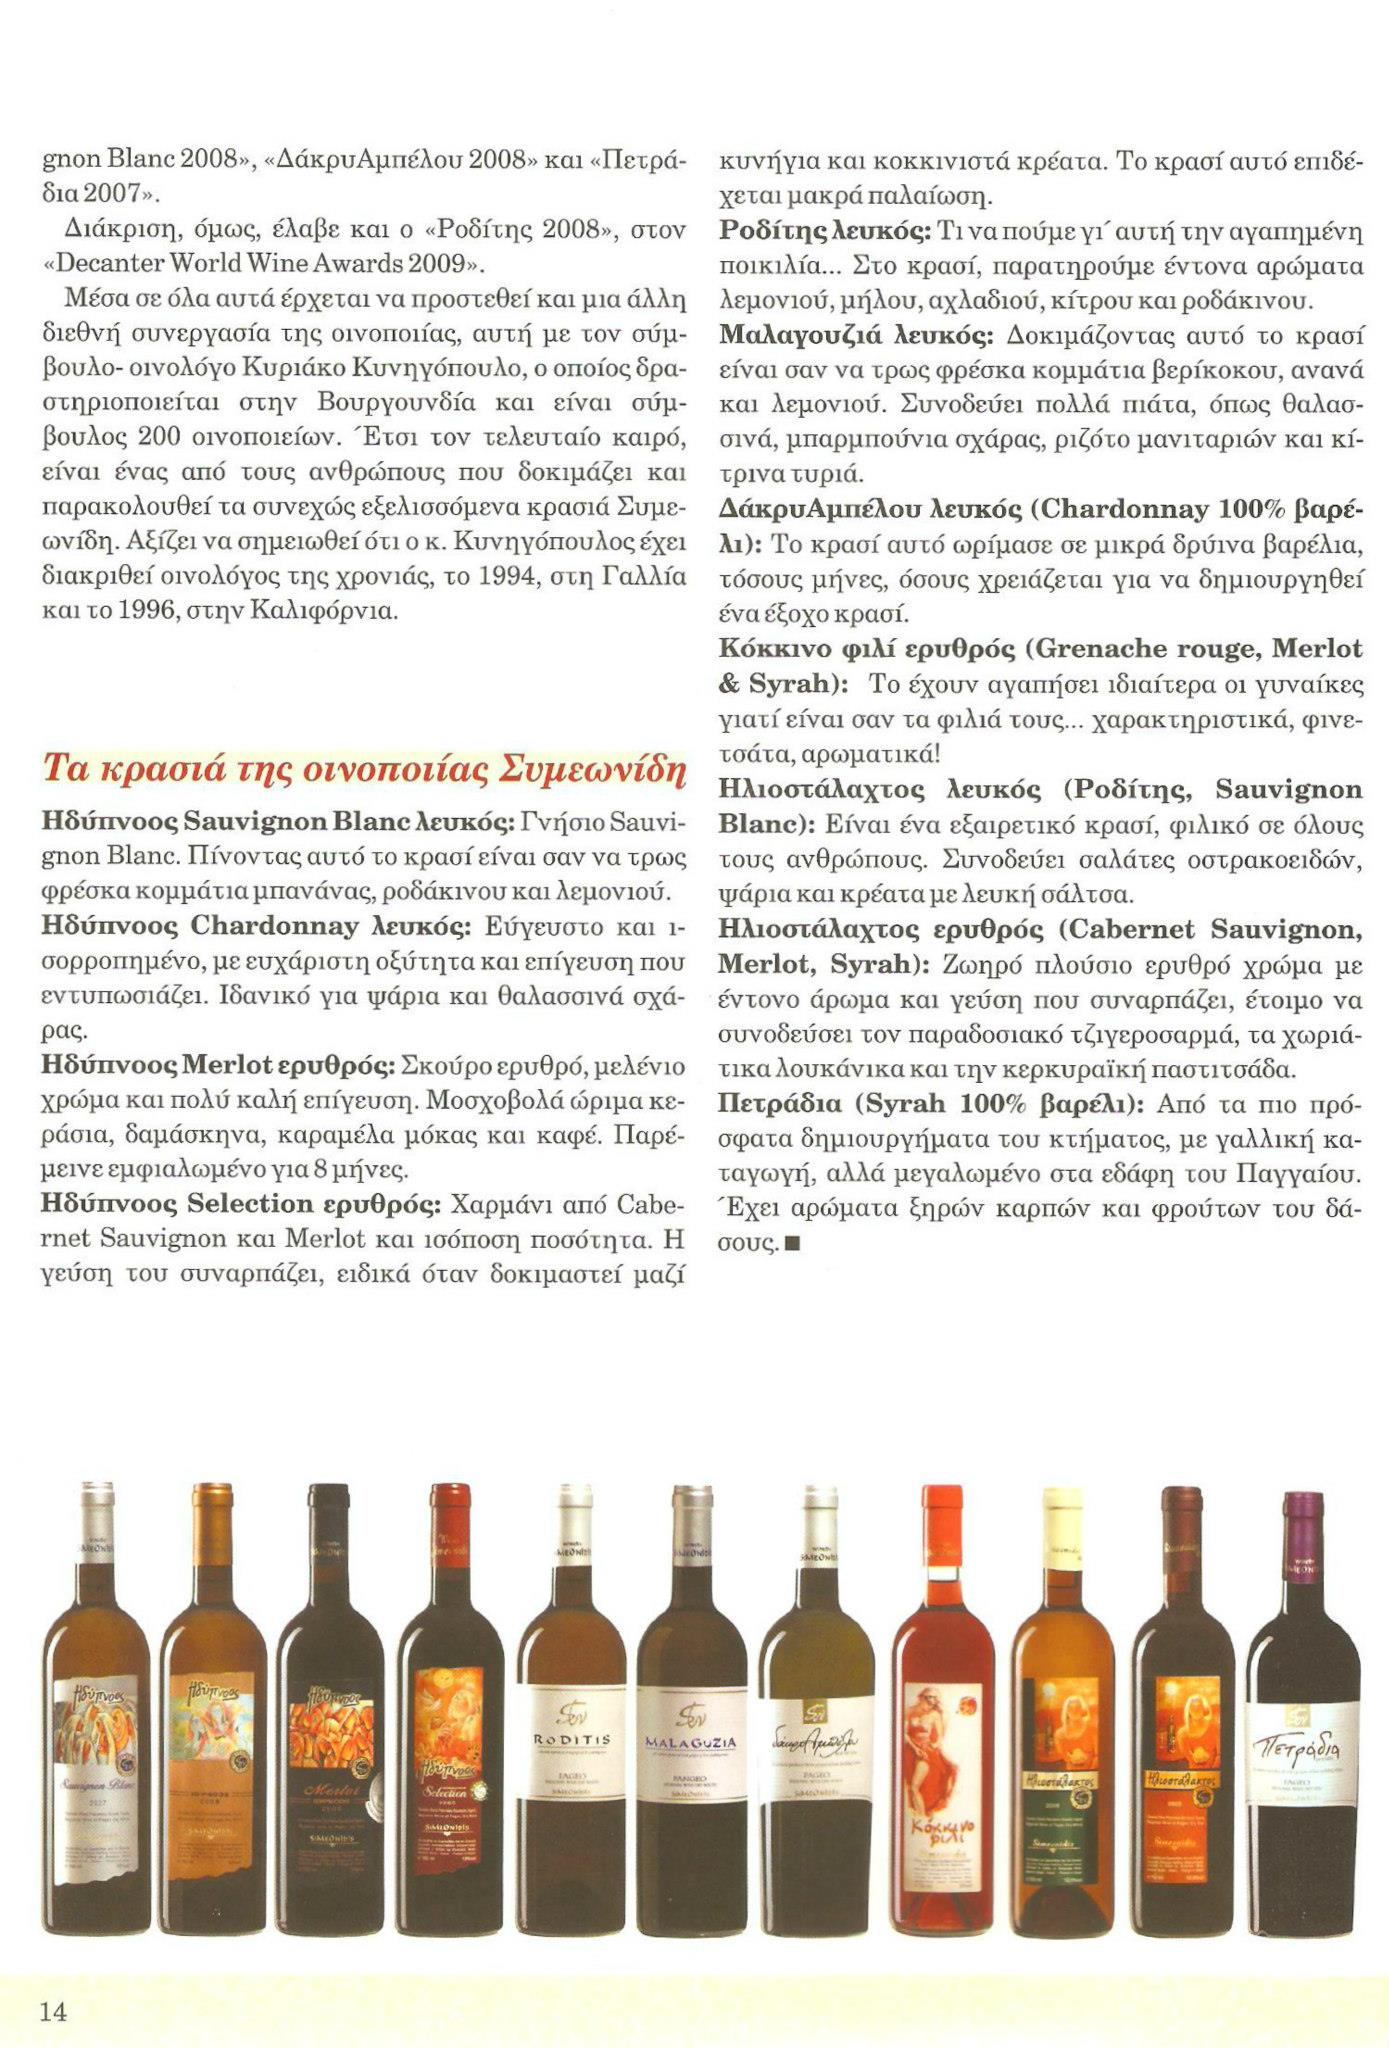 Import Magazine, Issue 46, October 2009